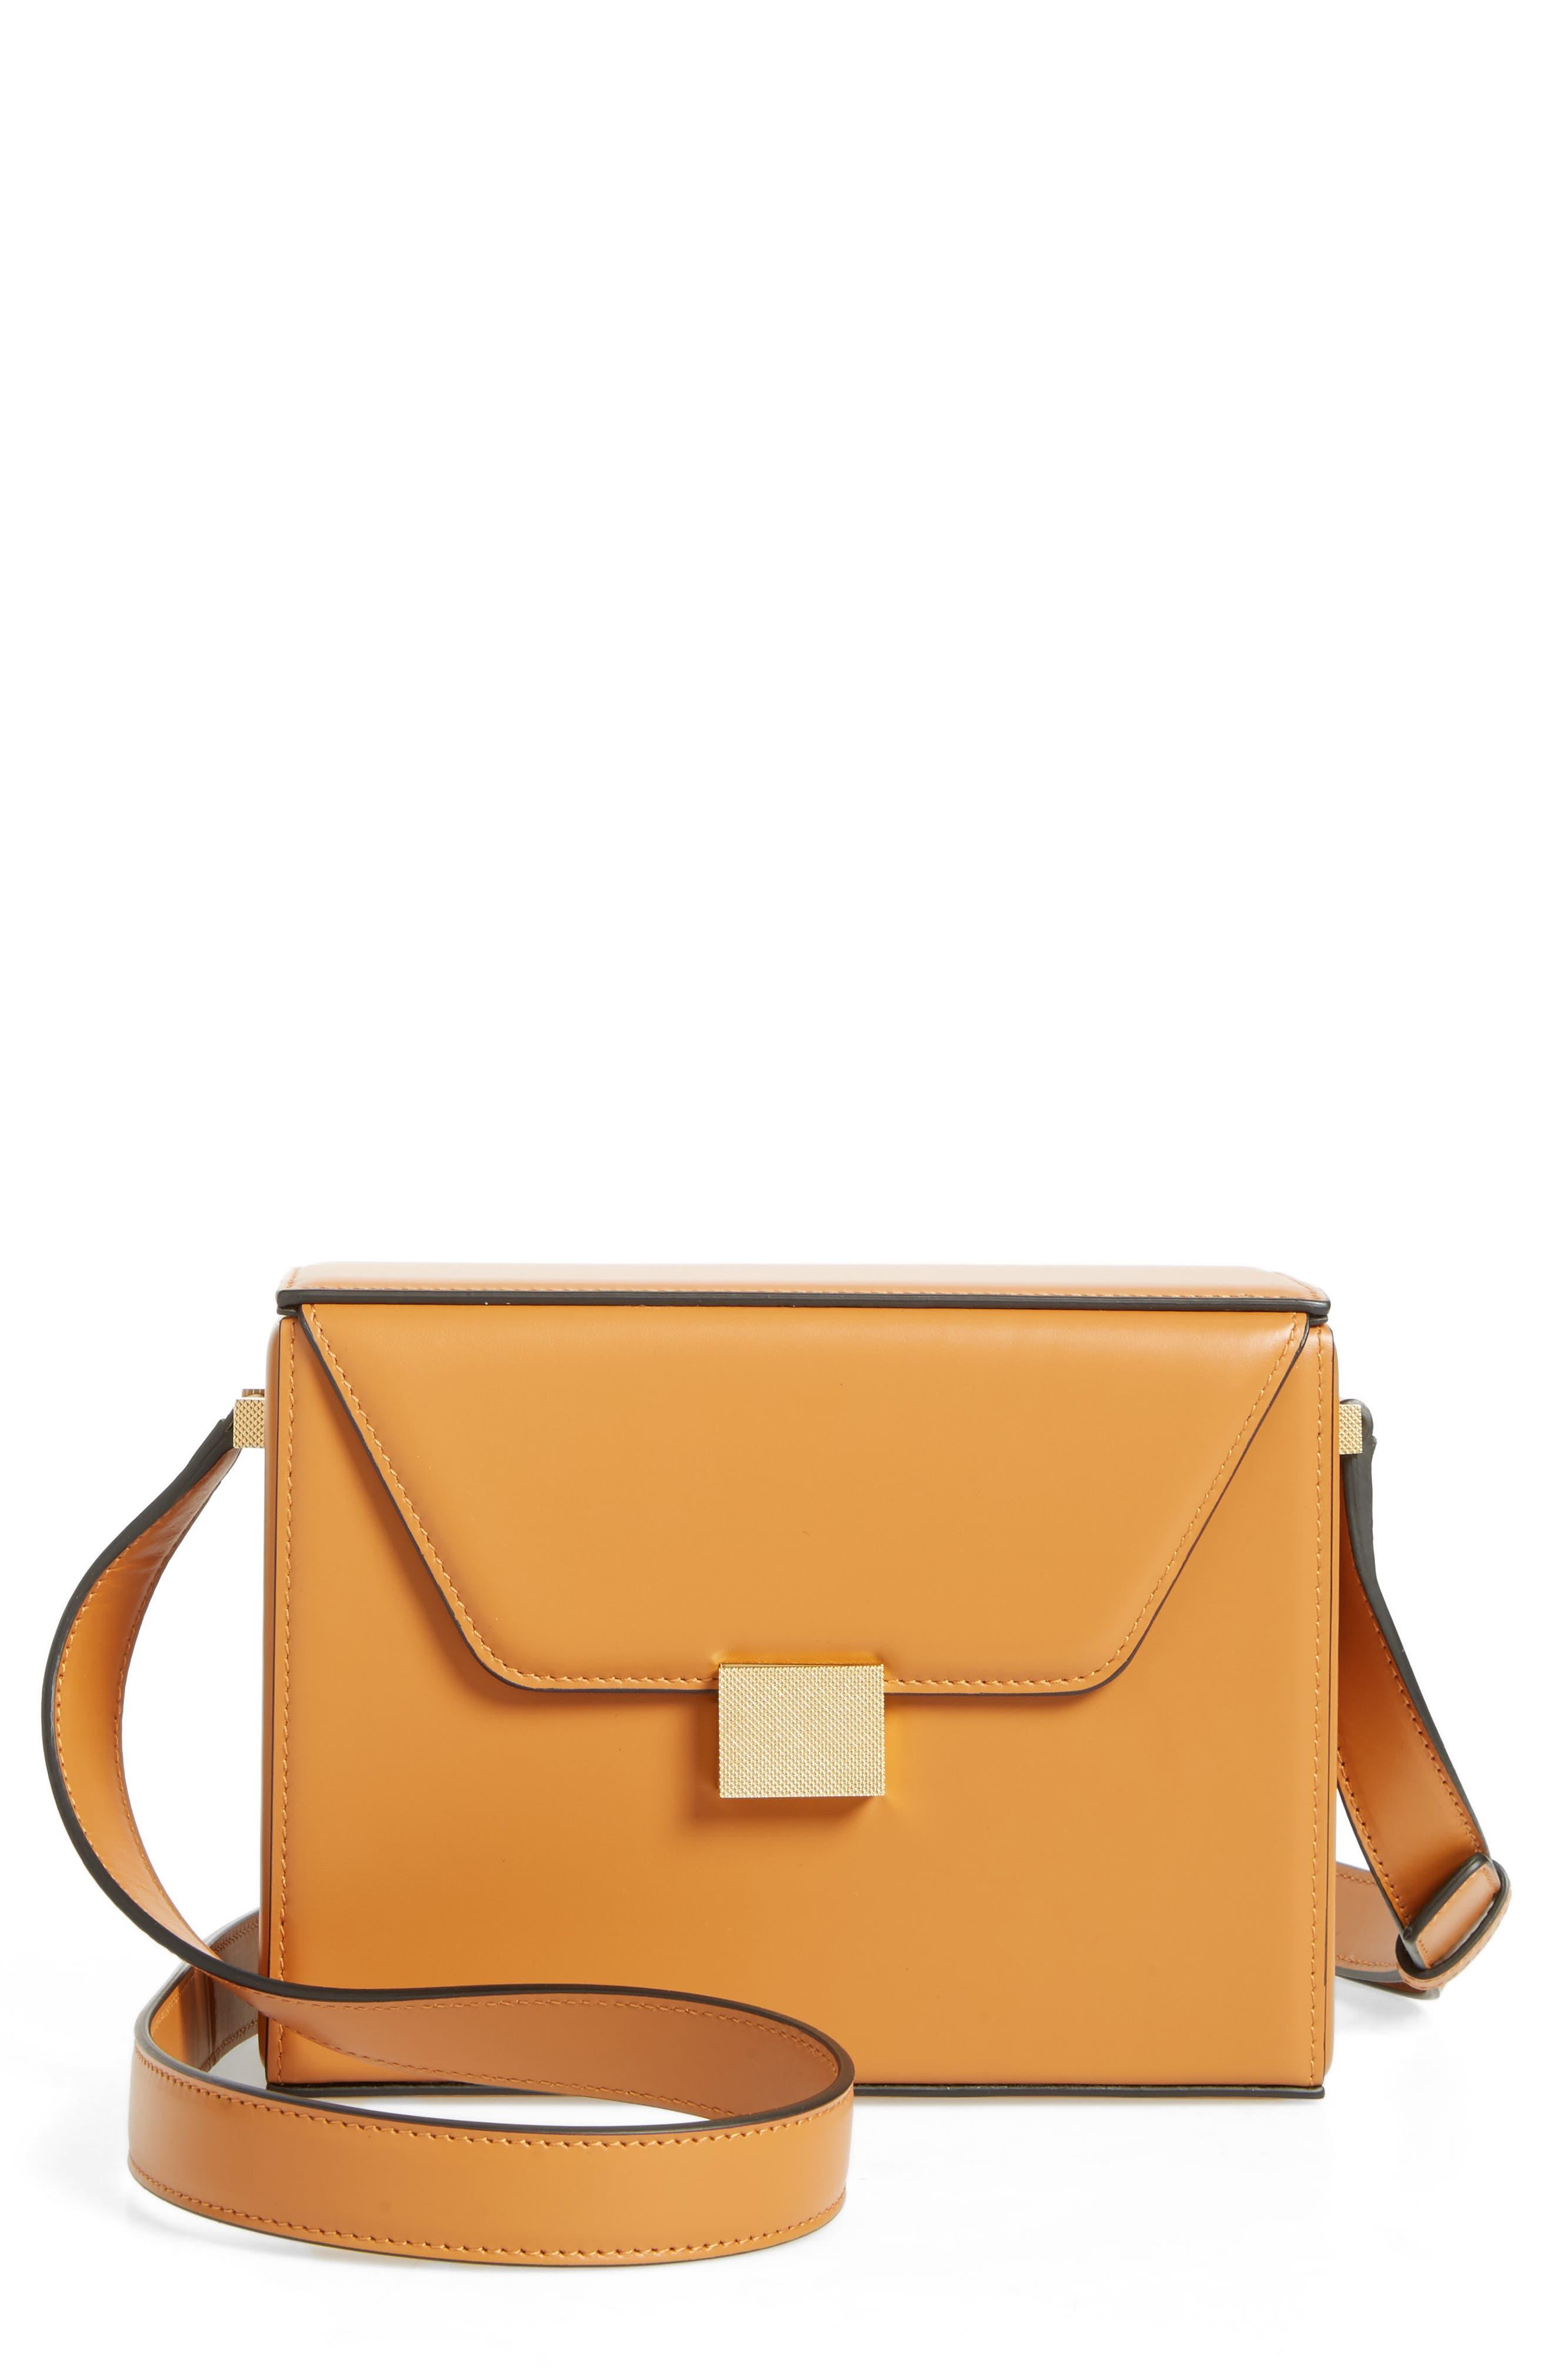 Main Image - Victoria Beckham Vanity Calfskin Leather Box Bag